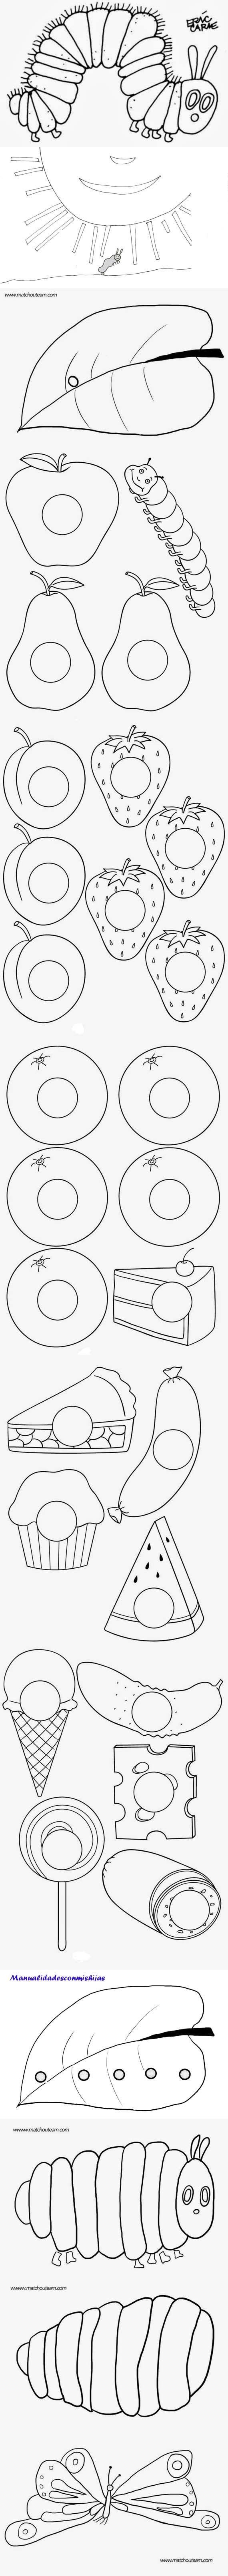 Libro para colorear de la Pequeña oruga glotona. Coloring book The very hungry caterpillar